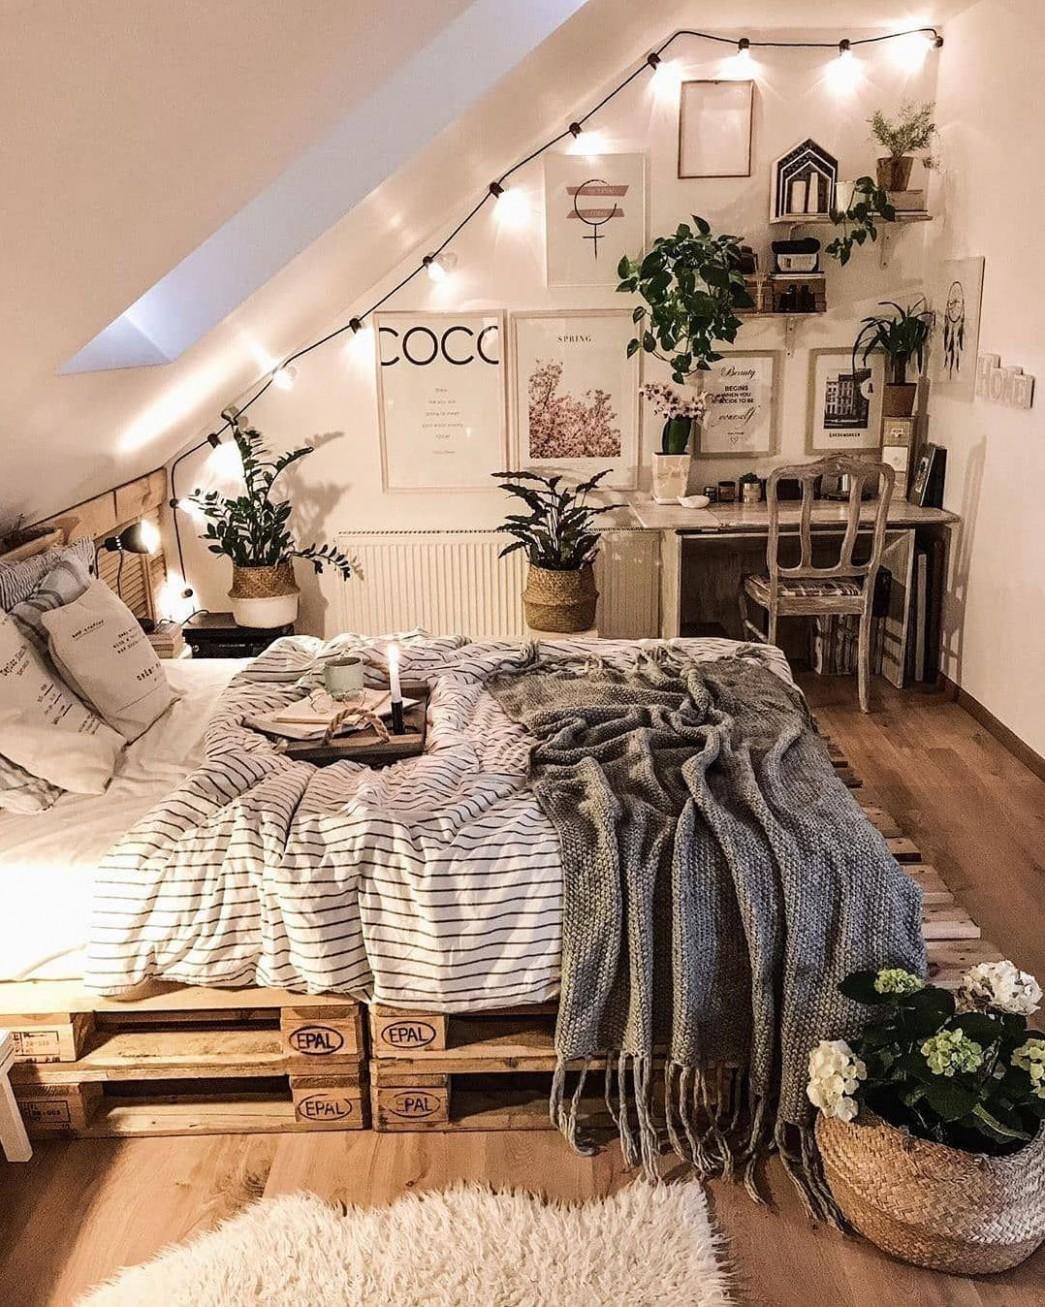 11 Impressive Small Apartment Decorating Ideas On A Budget - Futurian - Apartment Decorating Ideas Photos